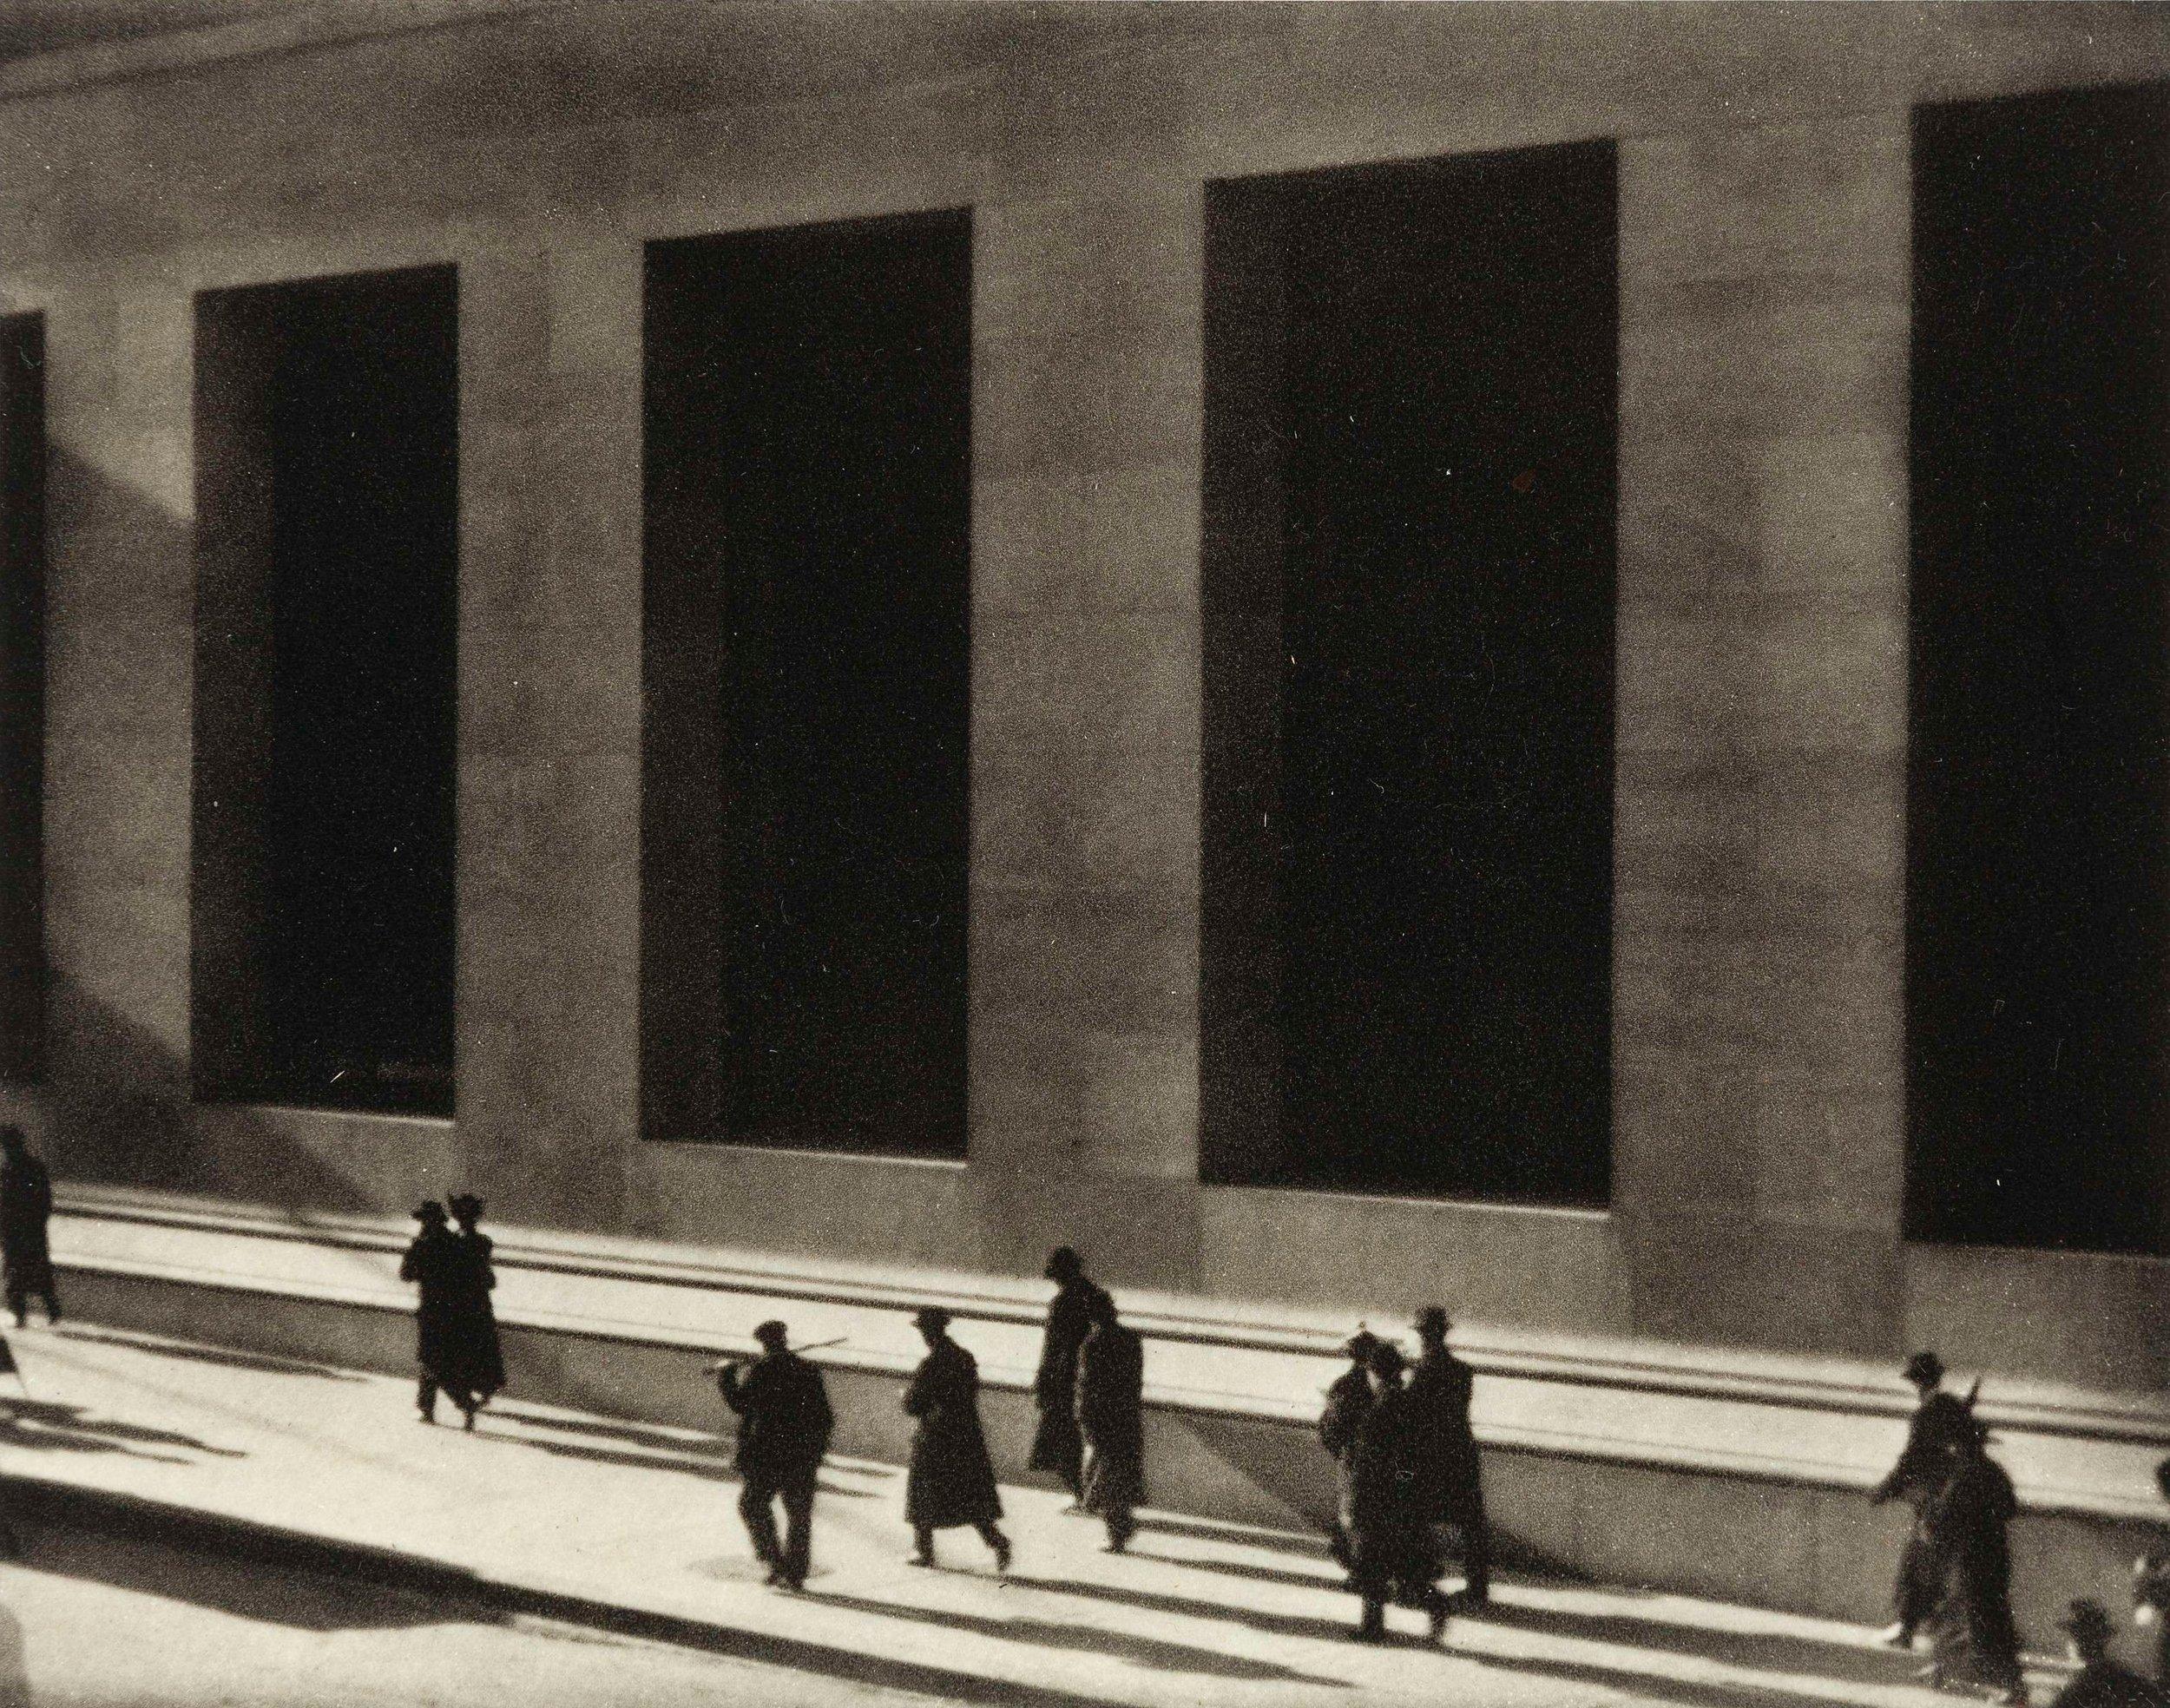 Wall_Street_by_Paul_Strand,_1915.jpg